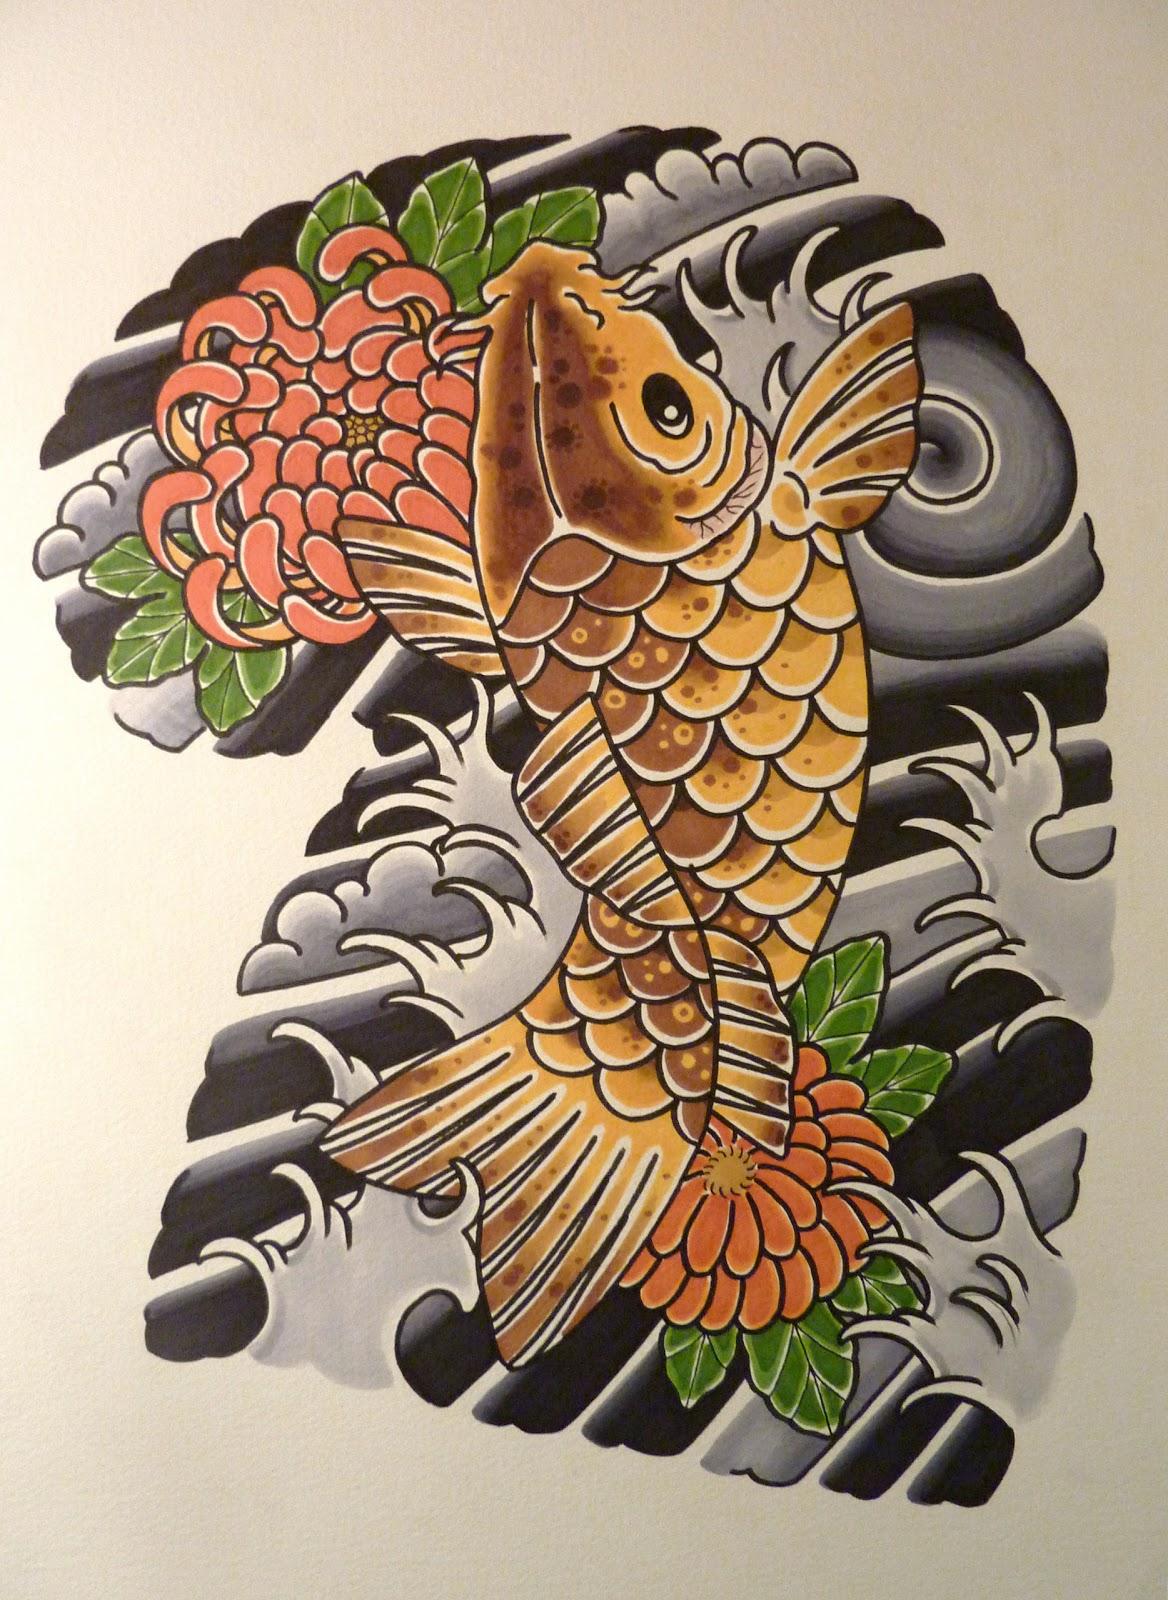 Andrea furci tattoos koi fish and chrysanthemums for Koi fish family